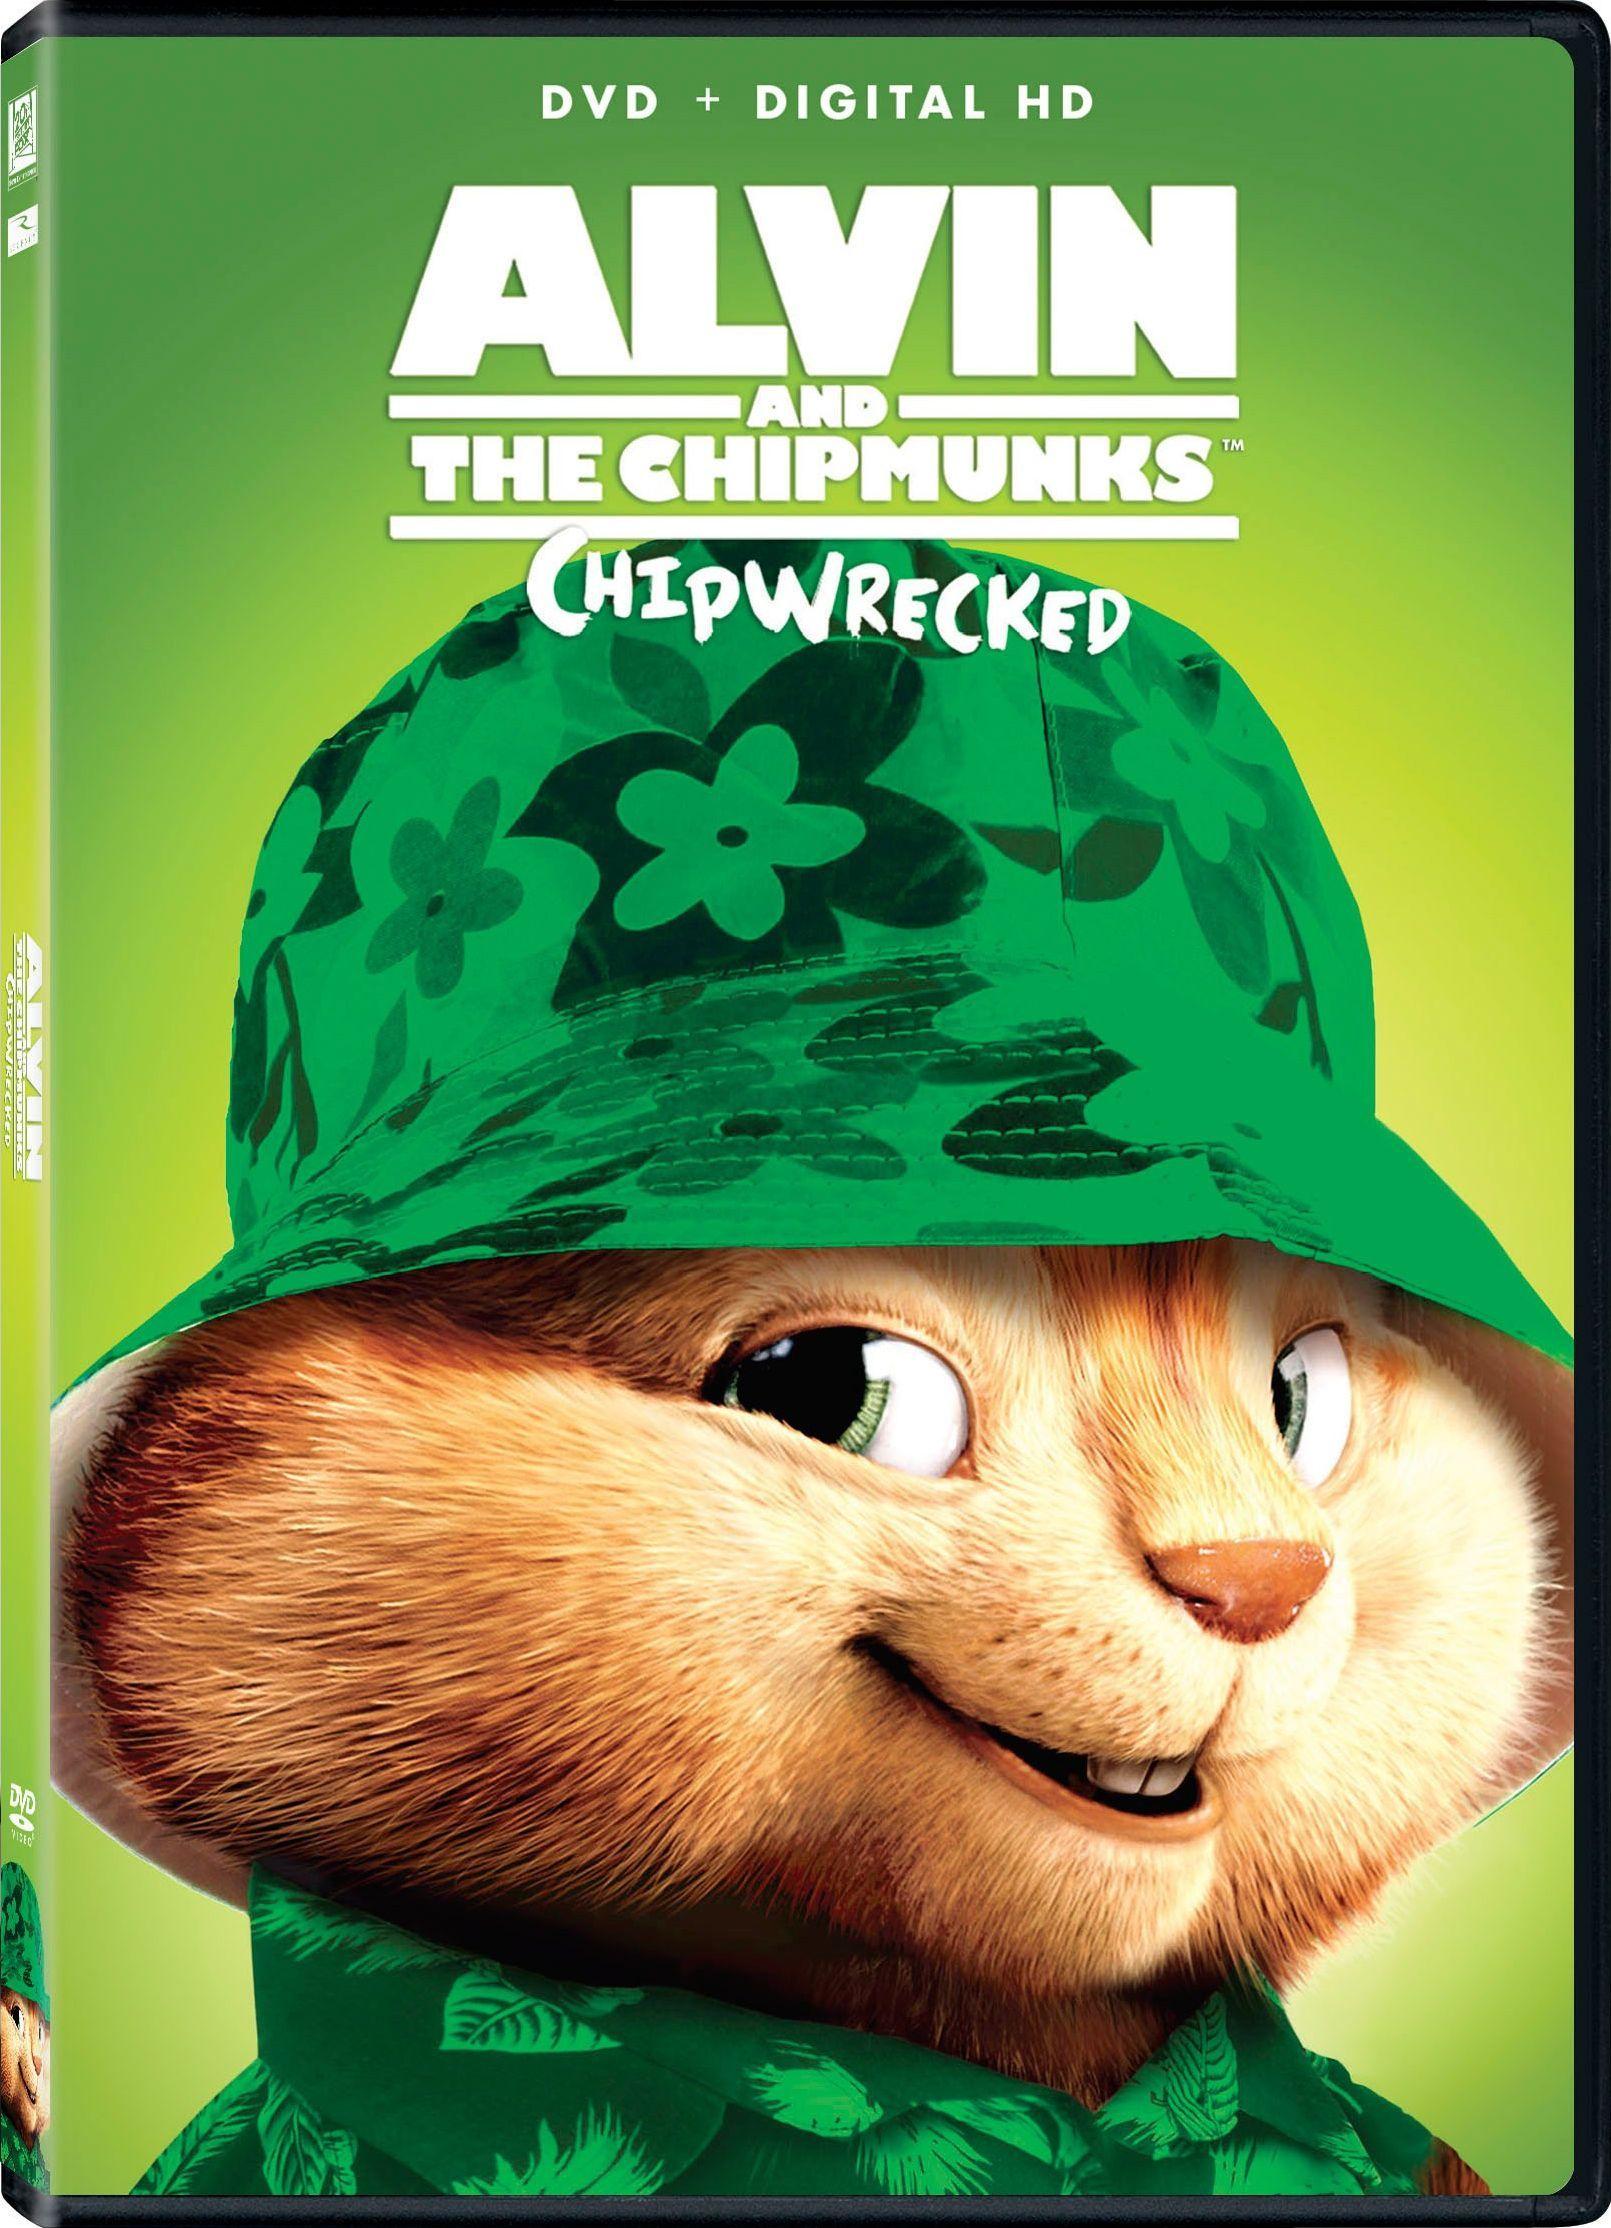 Alvin And The Chipmunks 3 Images alvin/chipmunks 3: chipwrecked | alvin, the chipmunks